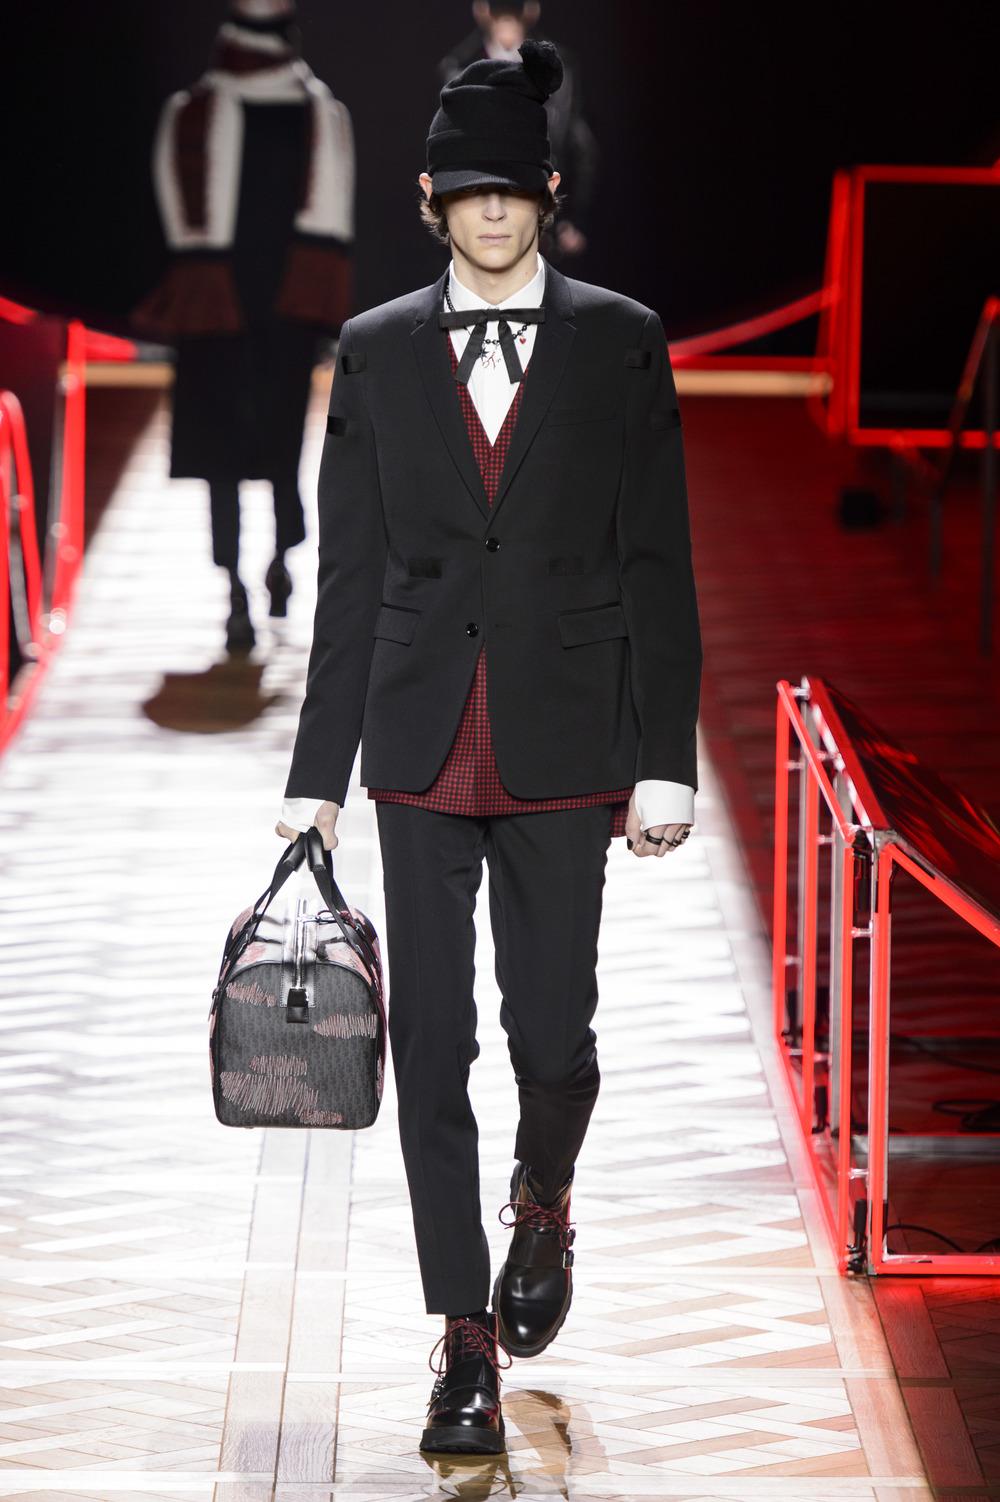 Dior_Homme_Hiver2016-17_look_12.JPG